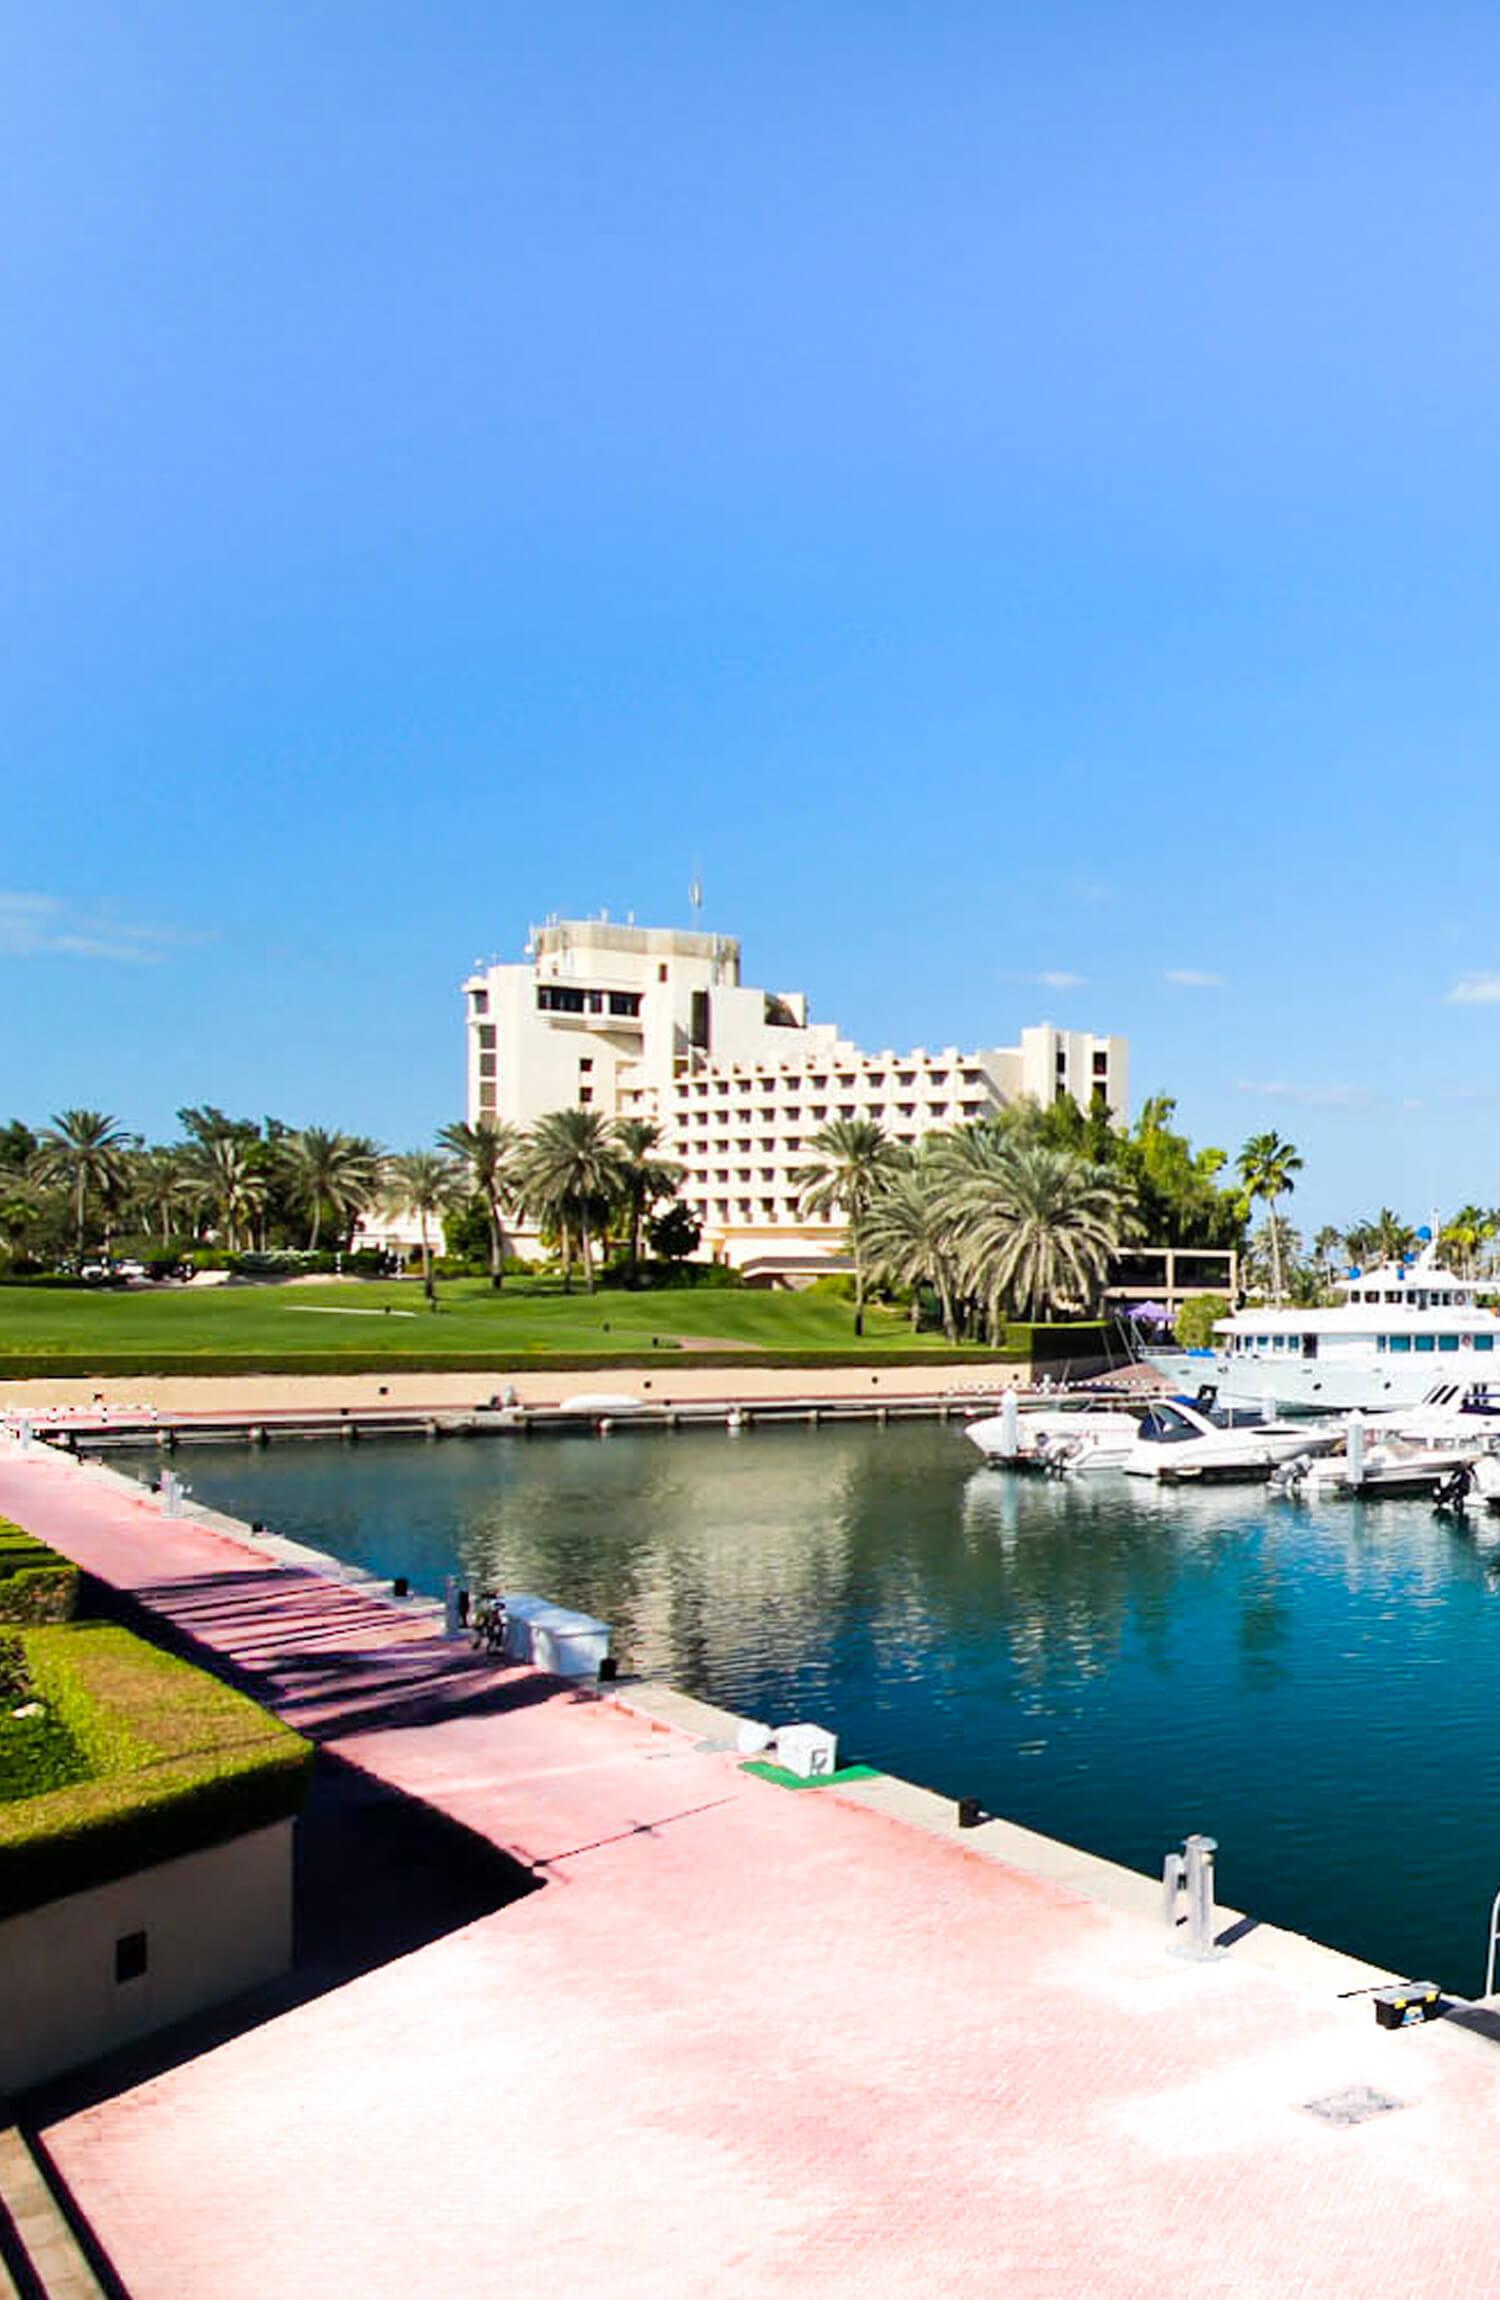 Ja Jebel Ali Dubai Beach Hotel - 5 Star Beachfront Resort